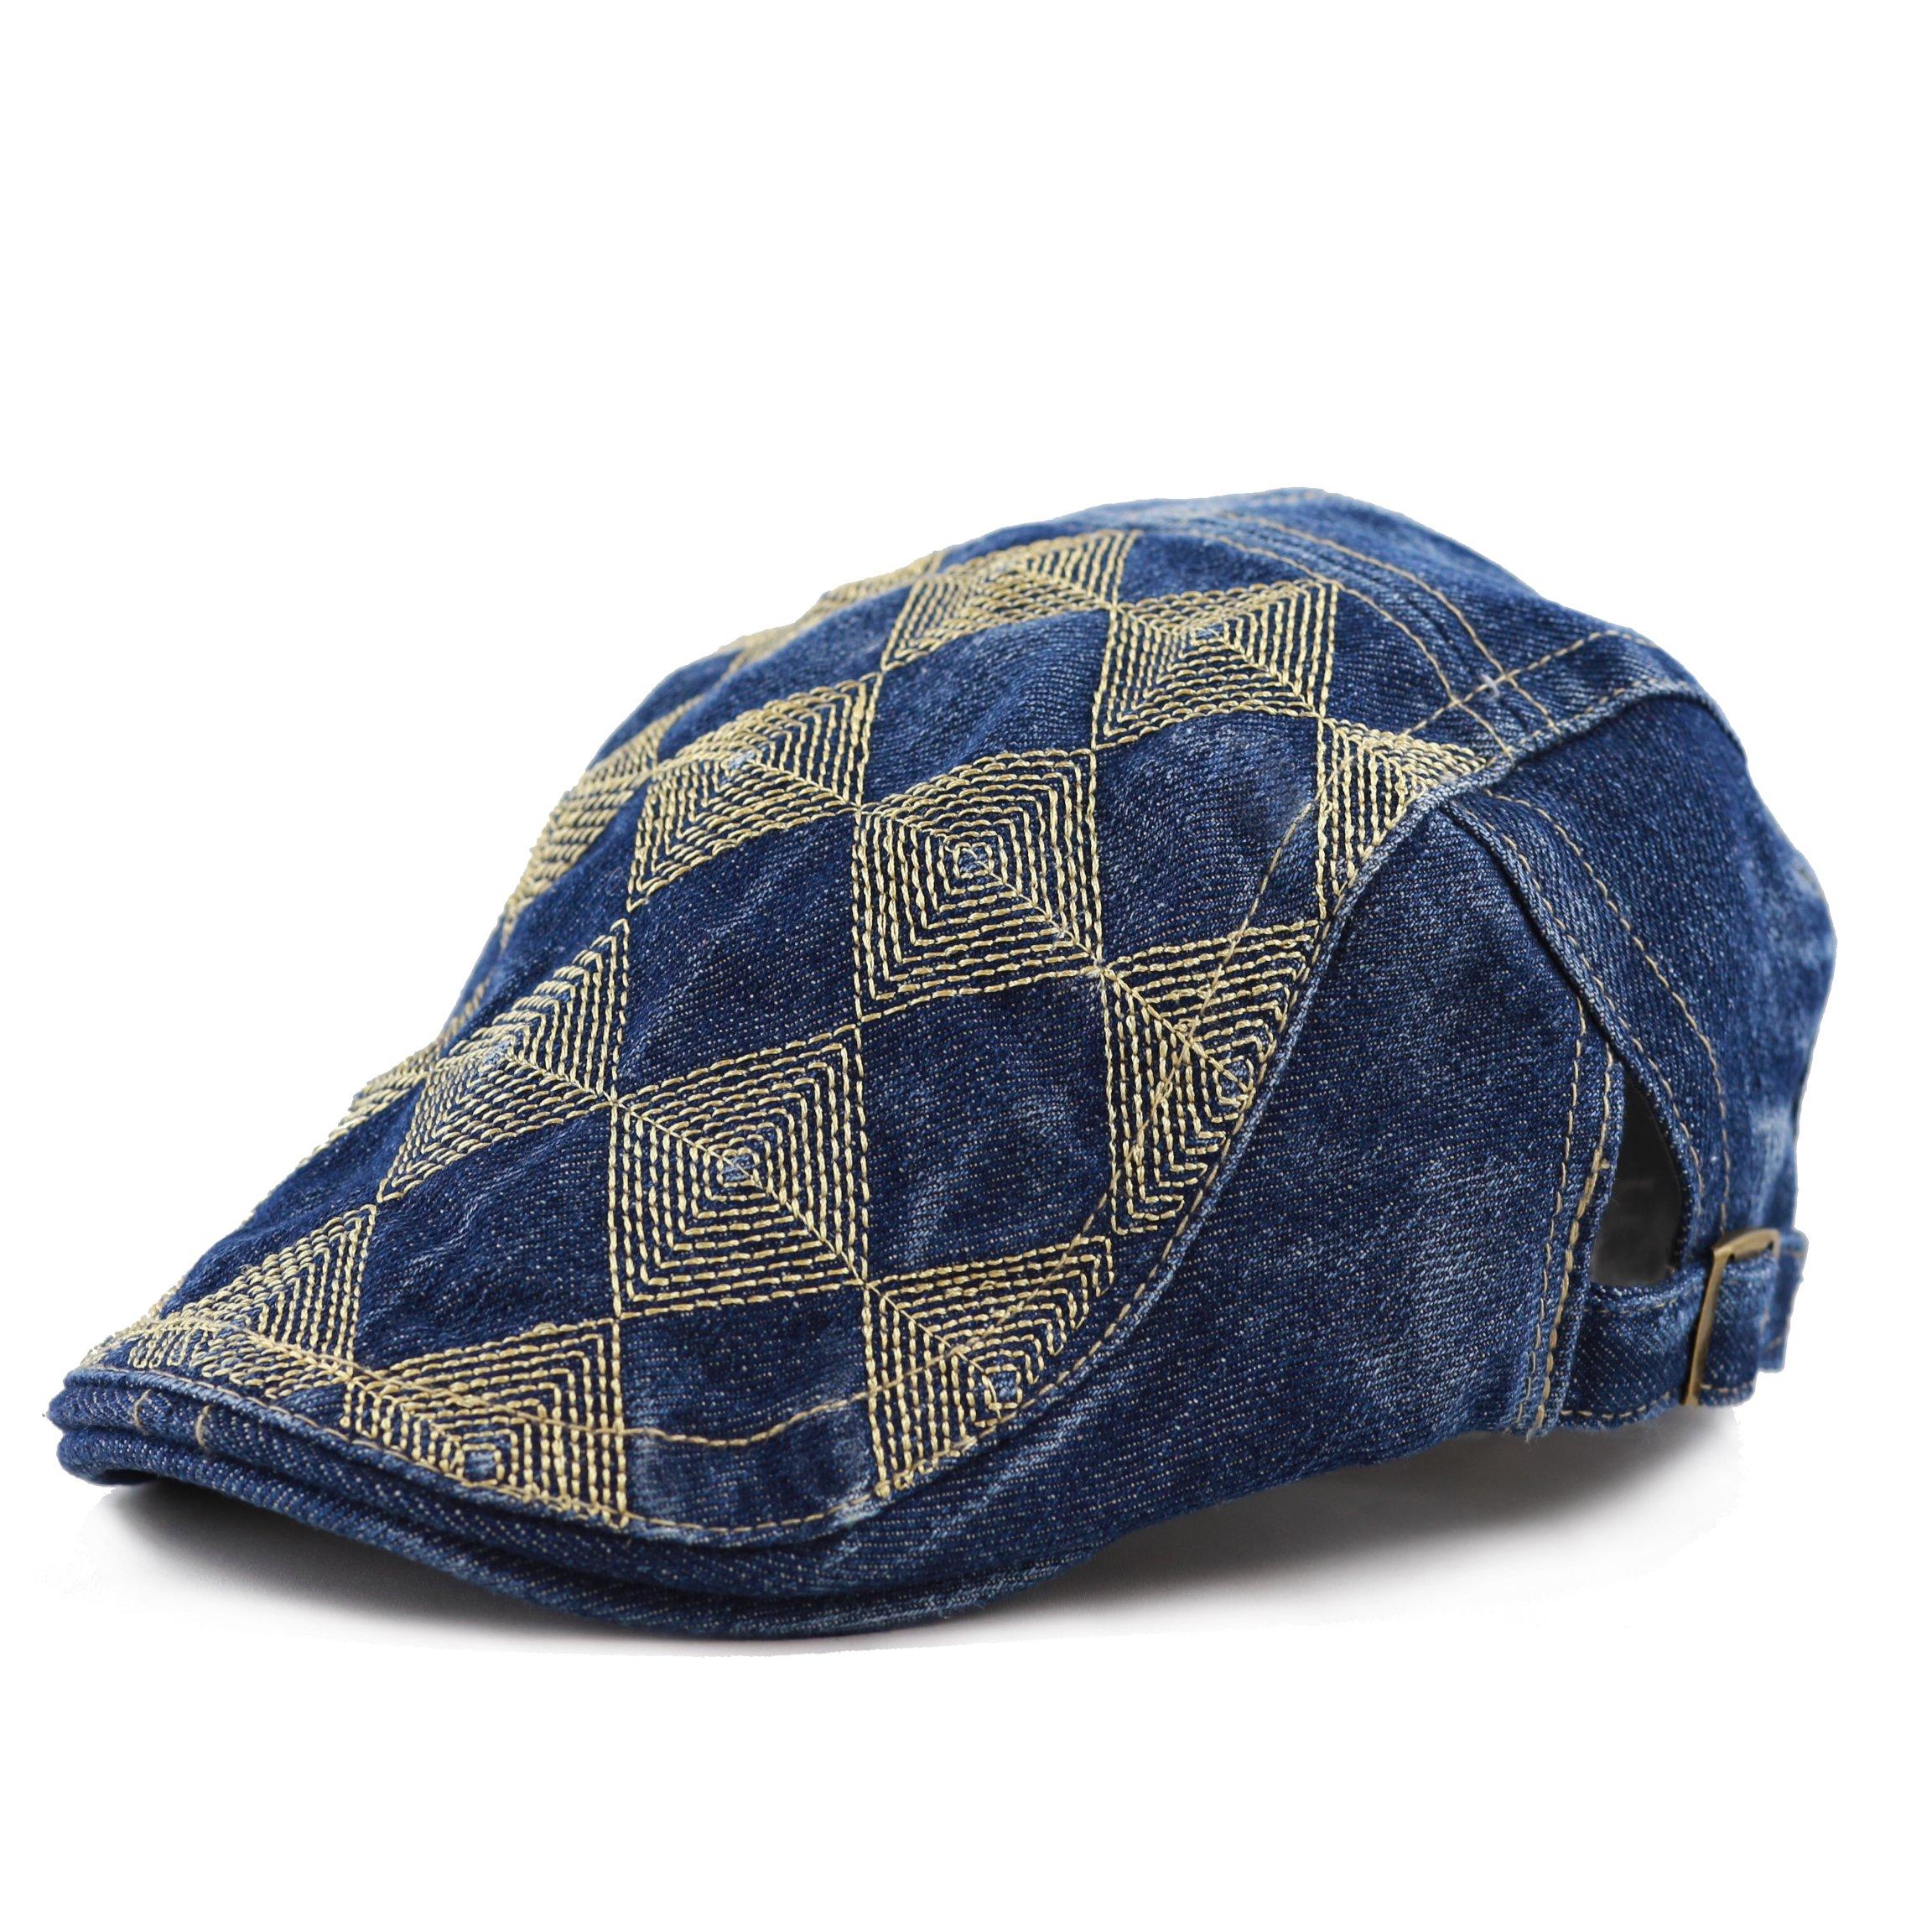 THE HAT DEPOT Variety Washed Denim Newsboy Ivy Style Hat (Denim blue16)